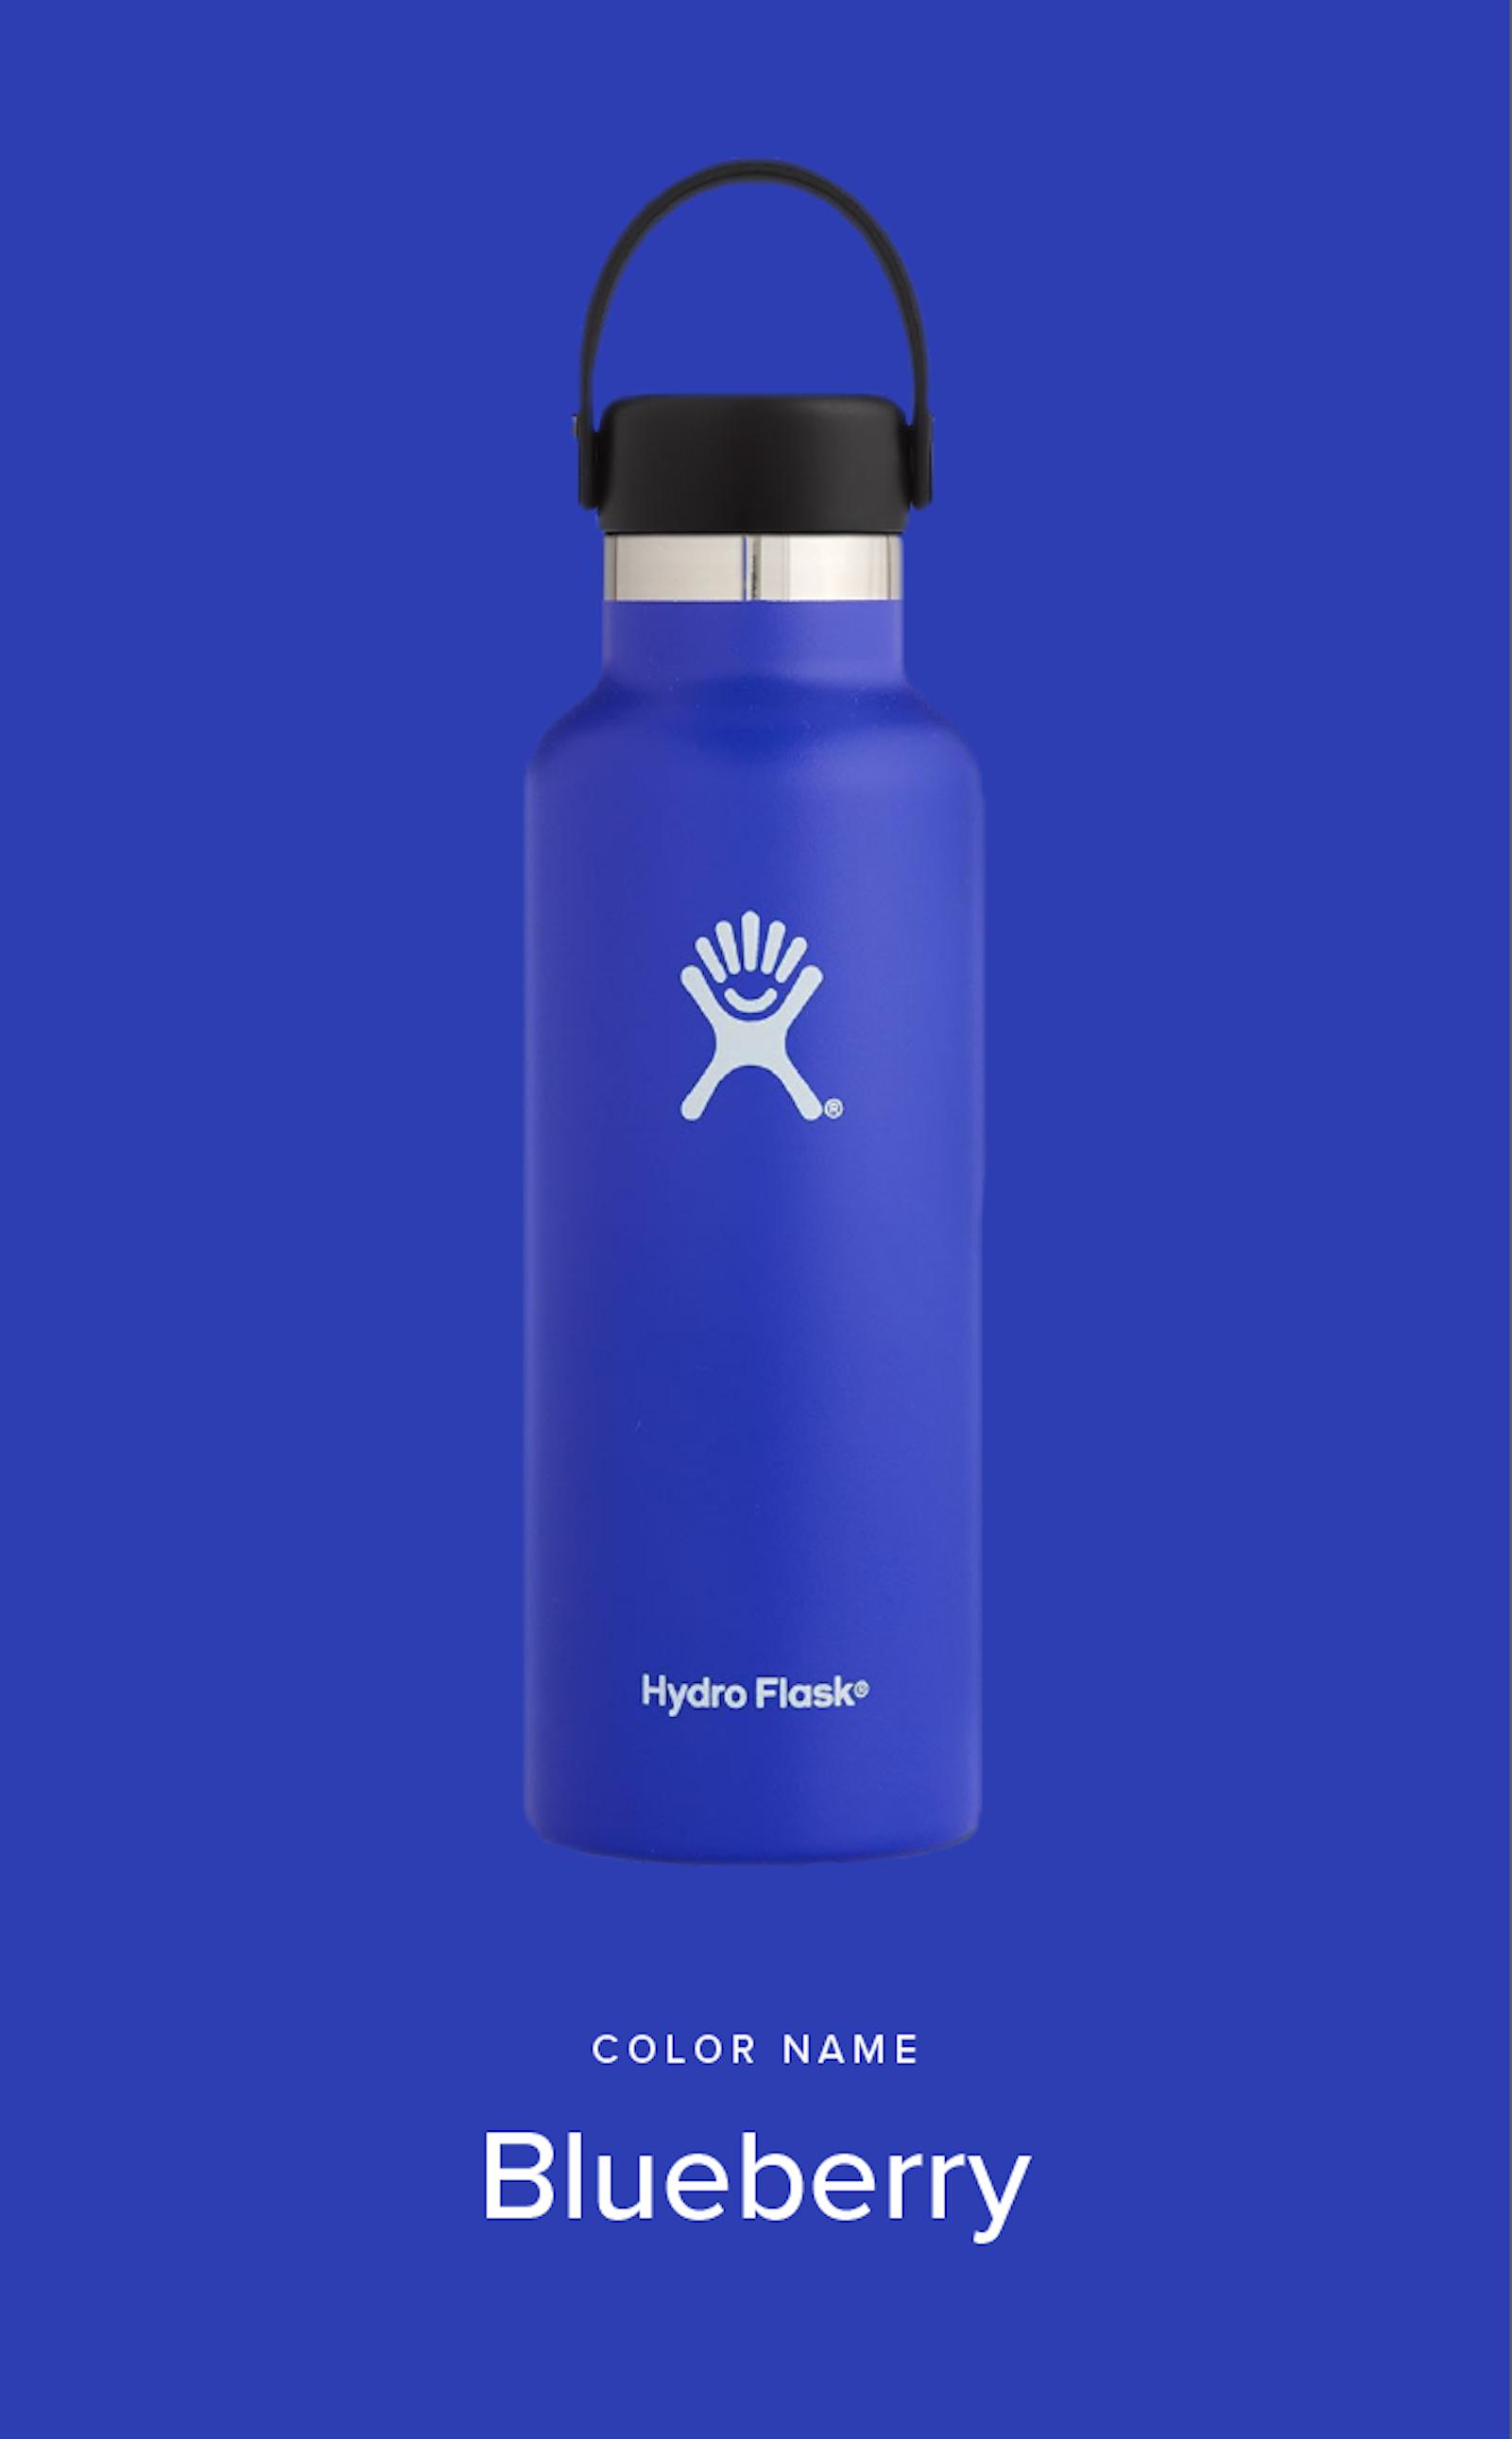 Hidro Flask Blue Berry